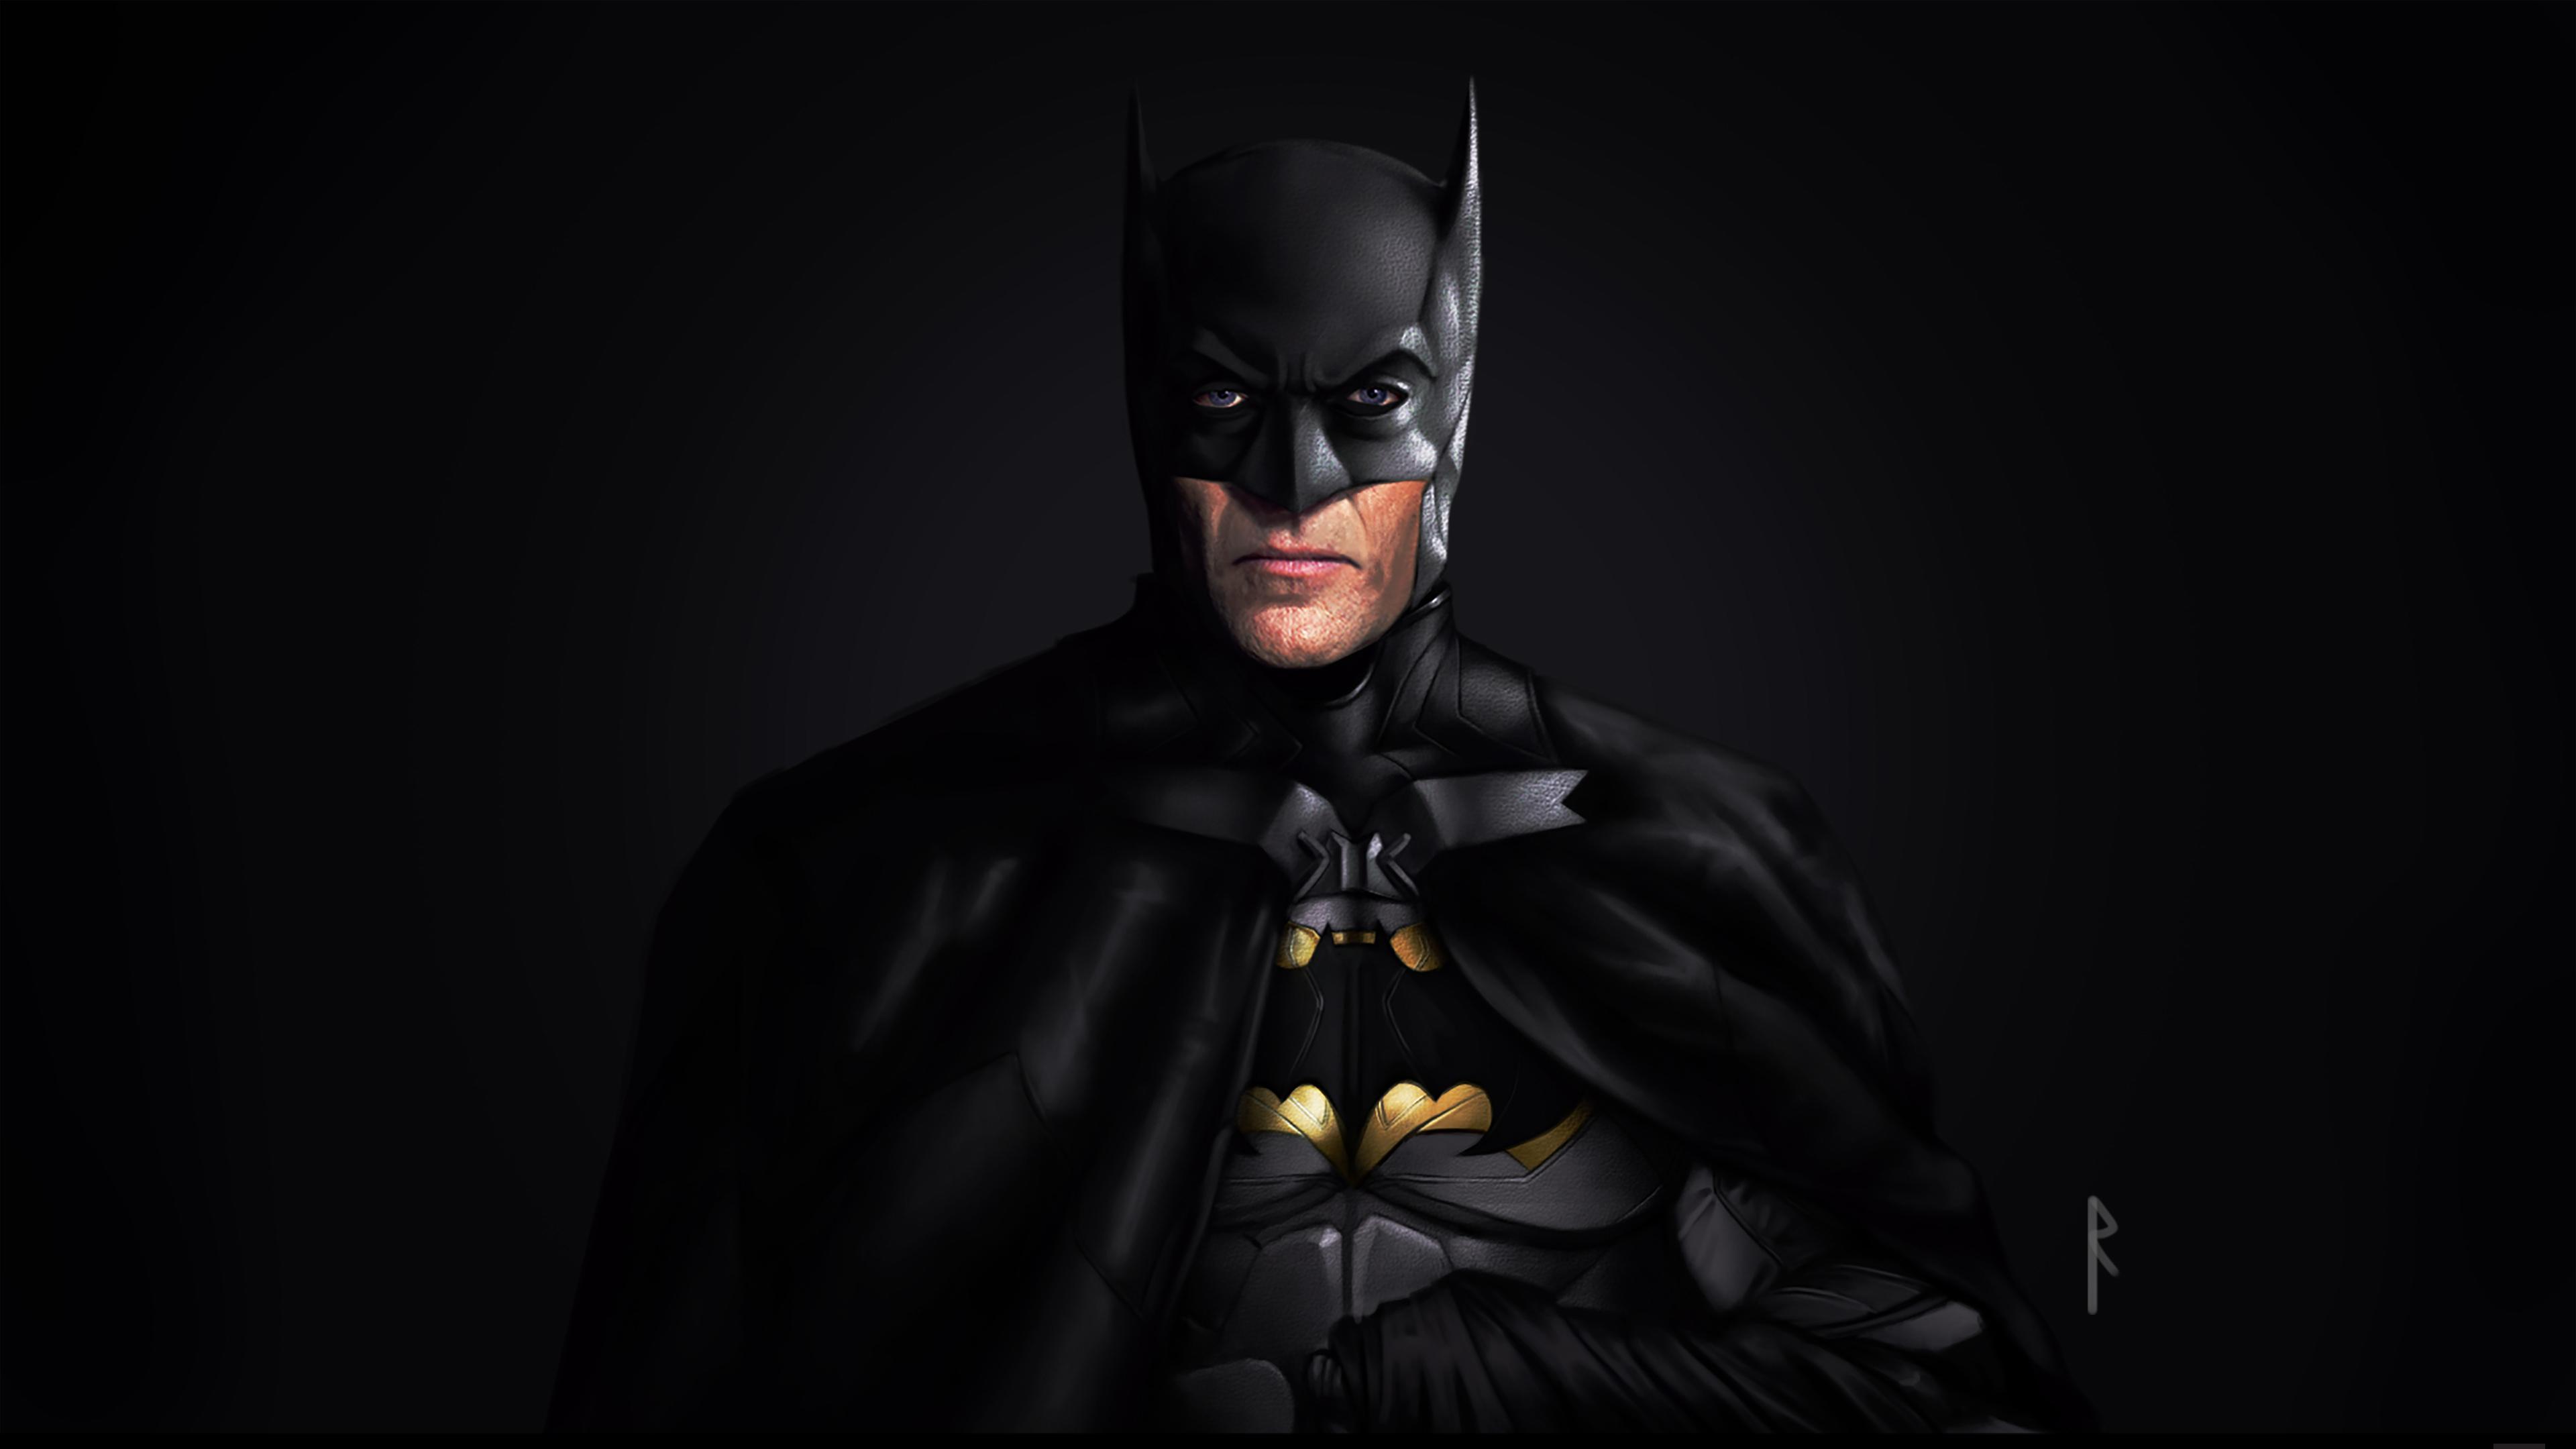 Batman 4k New Artwork 2019, HD Superheroes, 4k Wallpapers ...